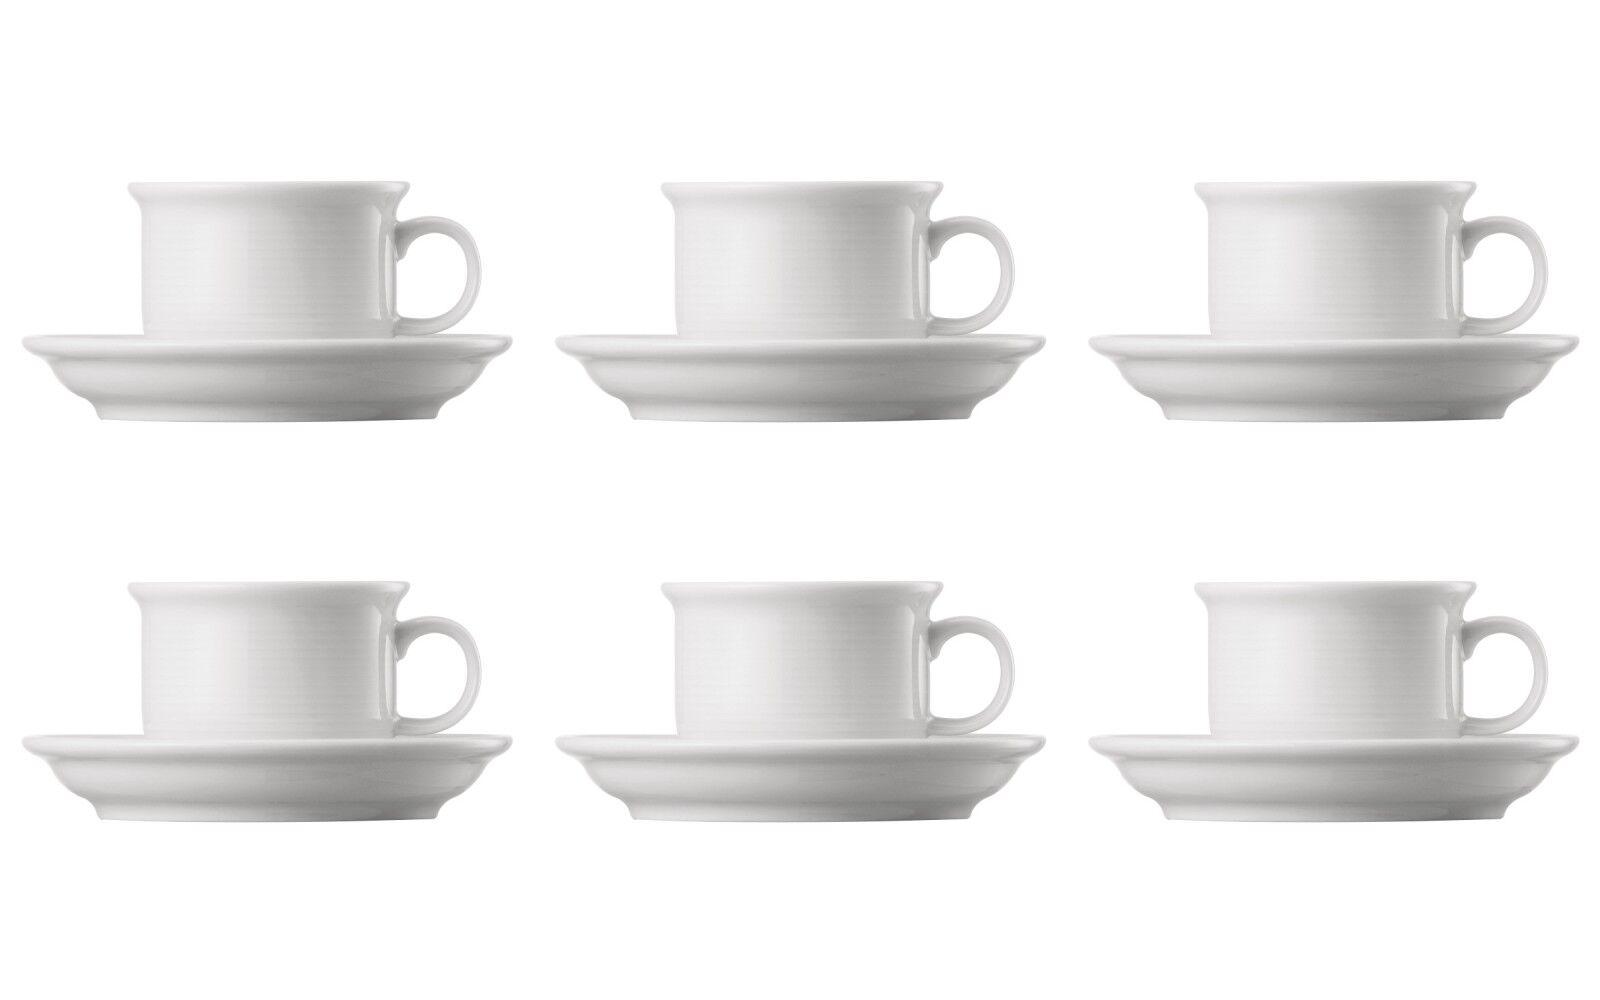 6 x Espresso-Obertasse 0,10 l + Untertasse 11,5 cm - Thomas Trend white - 14715